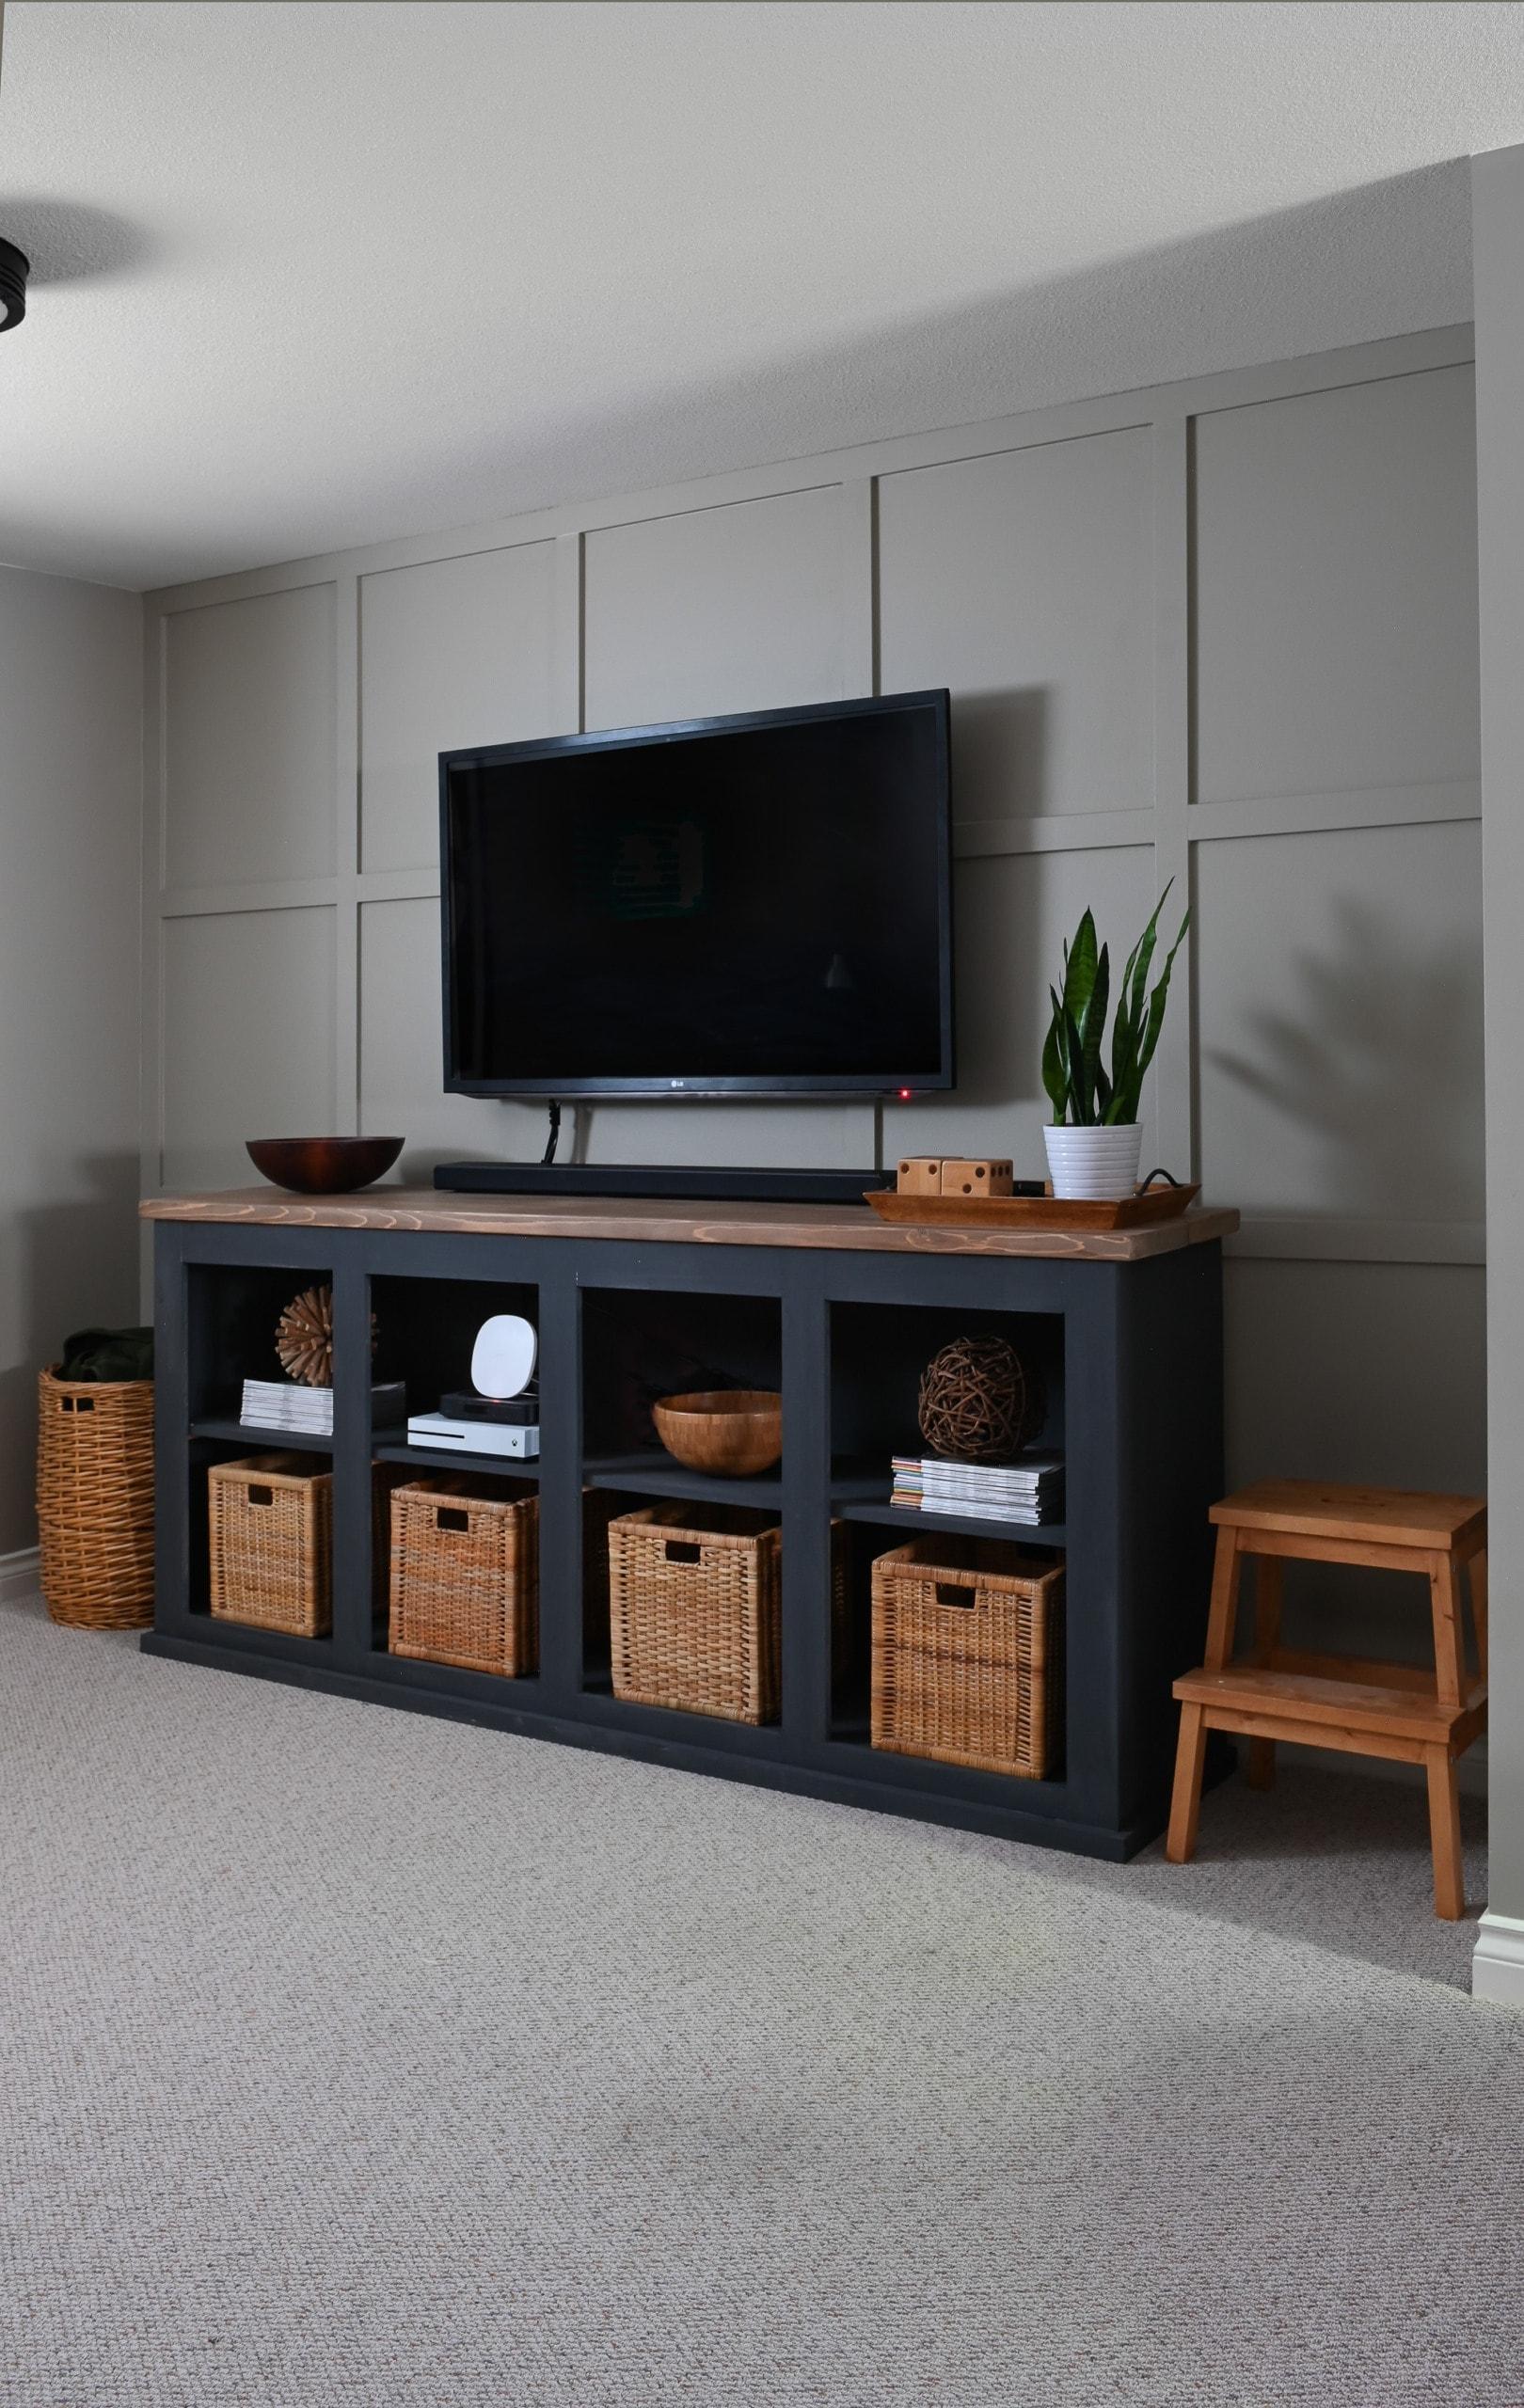 Dina's DIY basement console